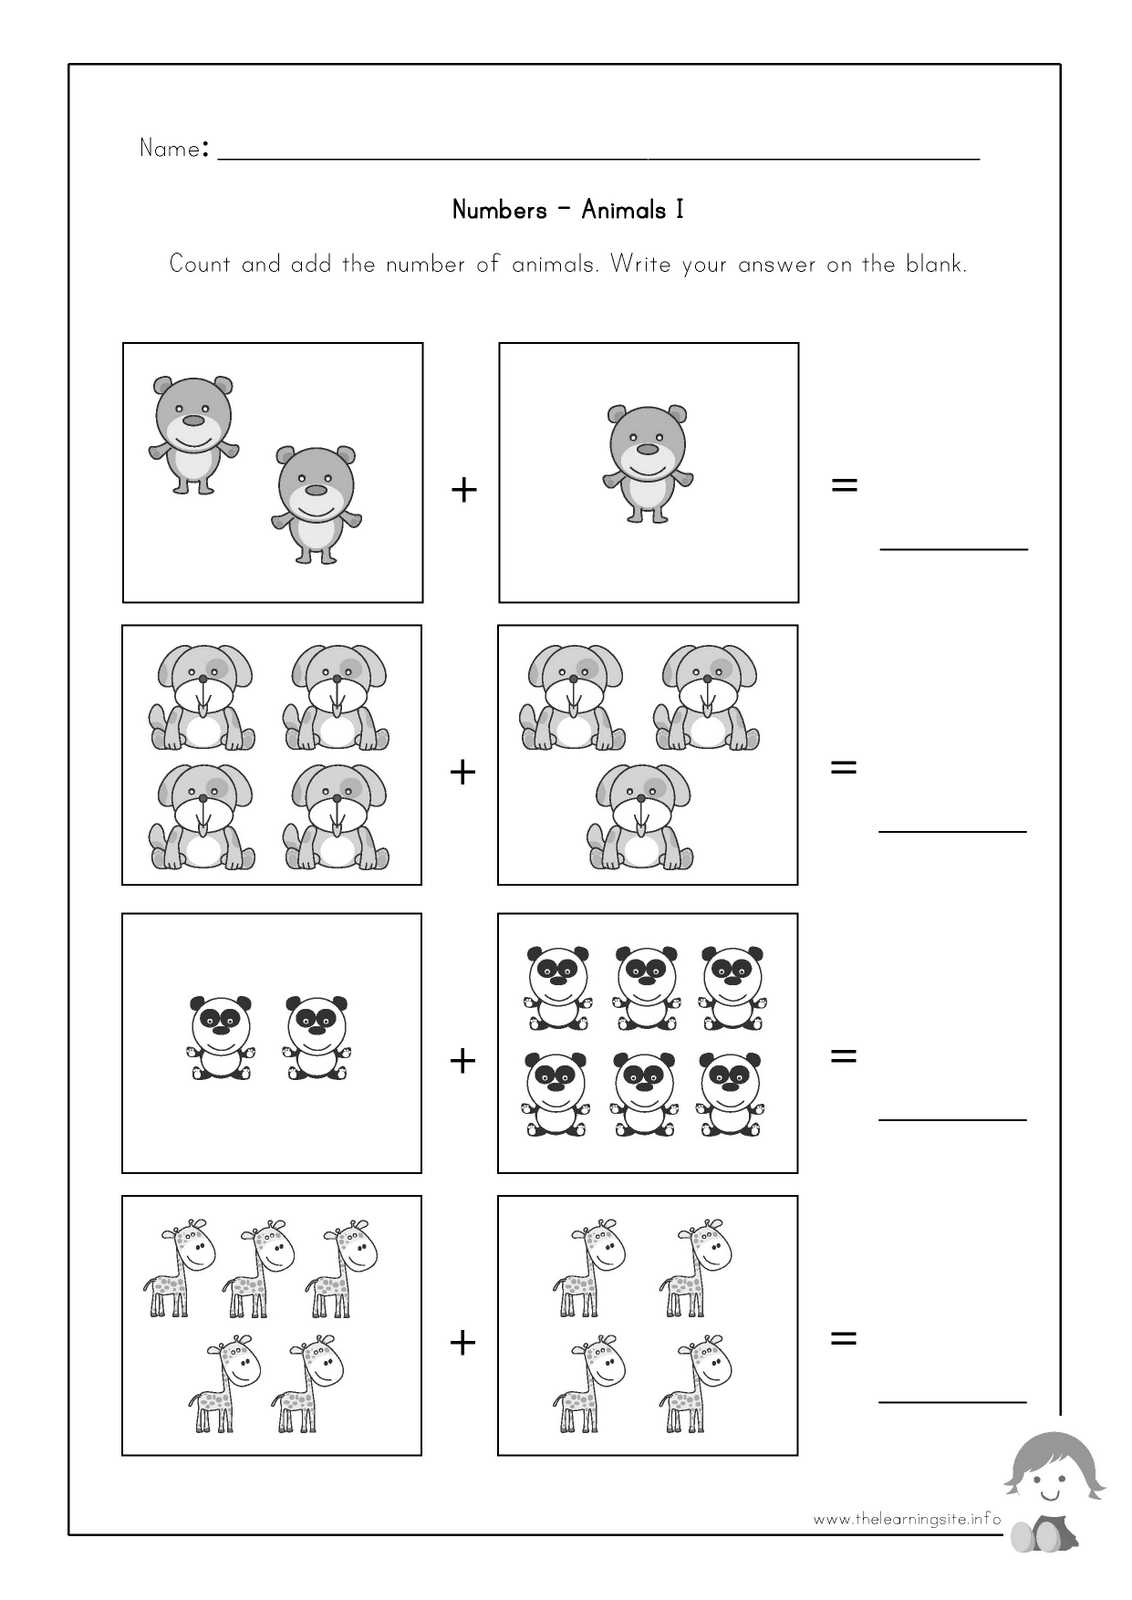 12 Best Images Of Starfall Worksheets For Kindergarten